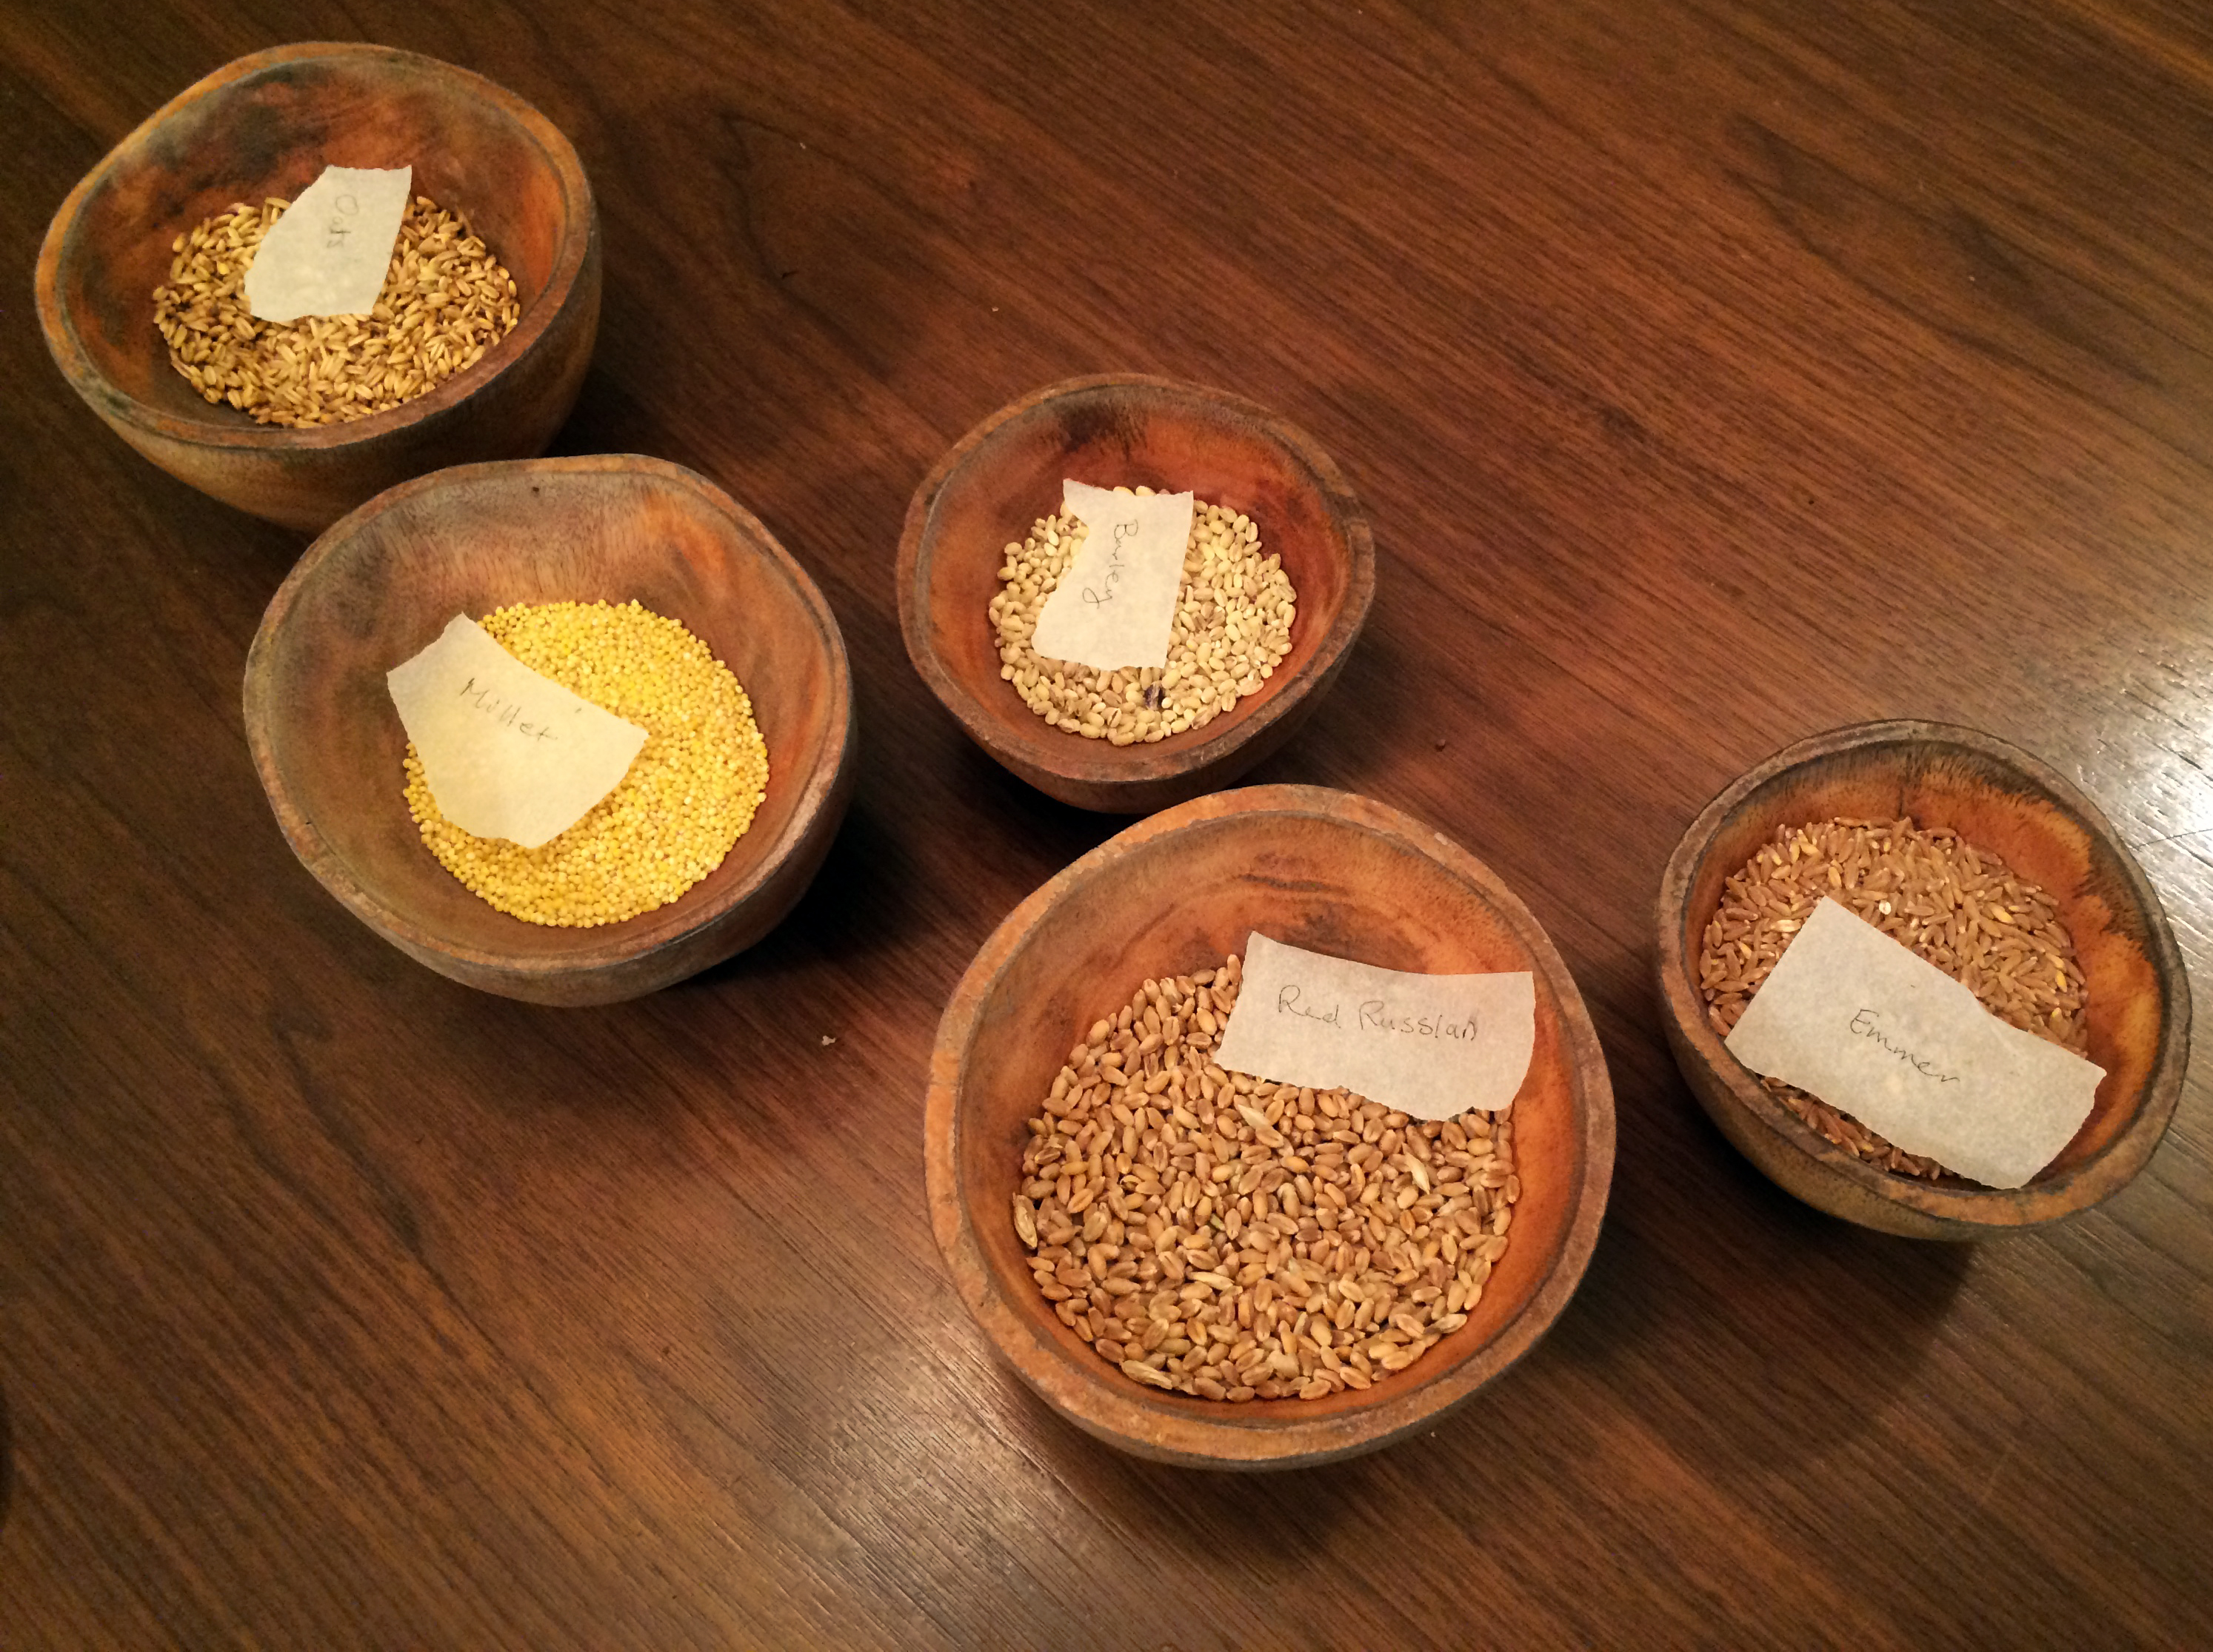 Barber Wheat : dan barber showed us grains from klaas martens farm in upstate new ...